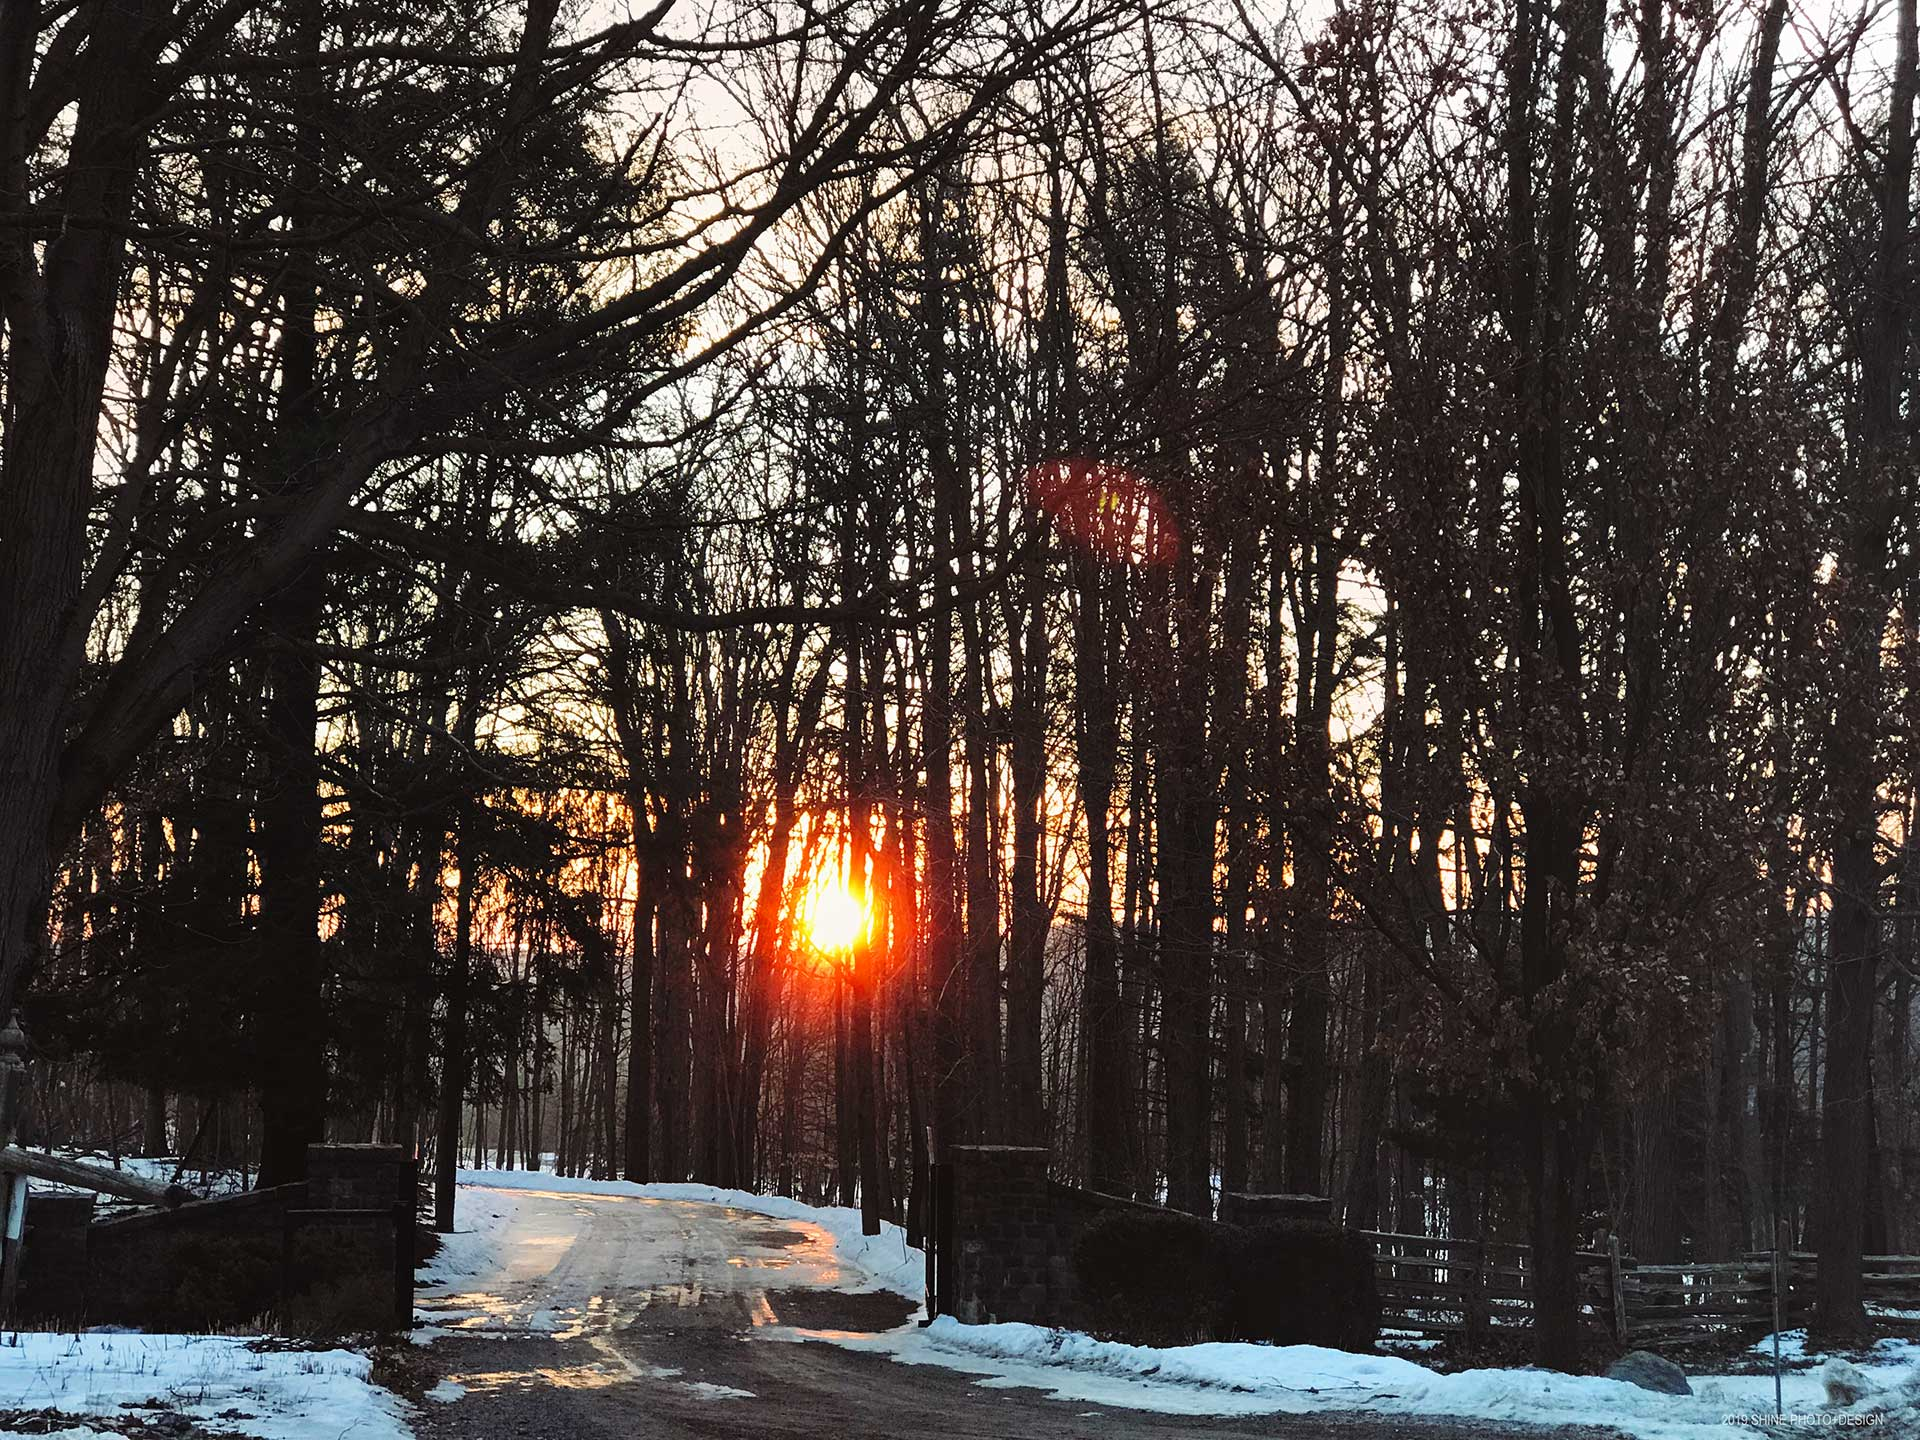 sunshine on snow by Shine Photo Design